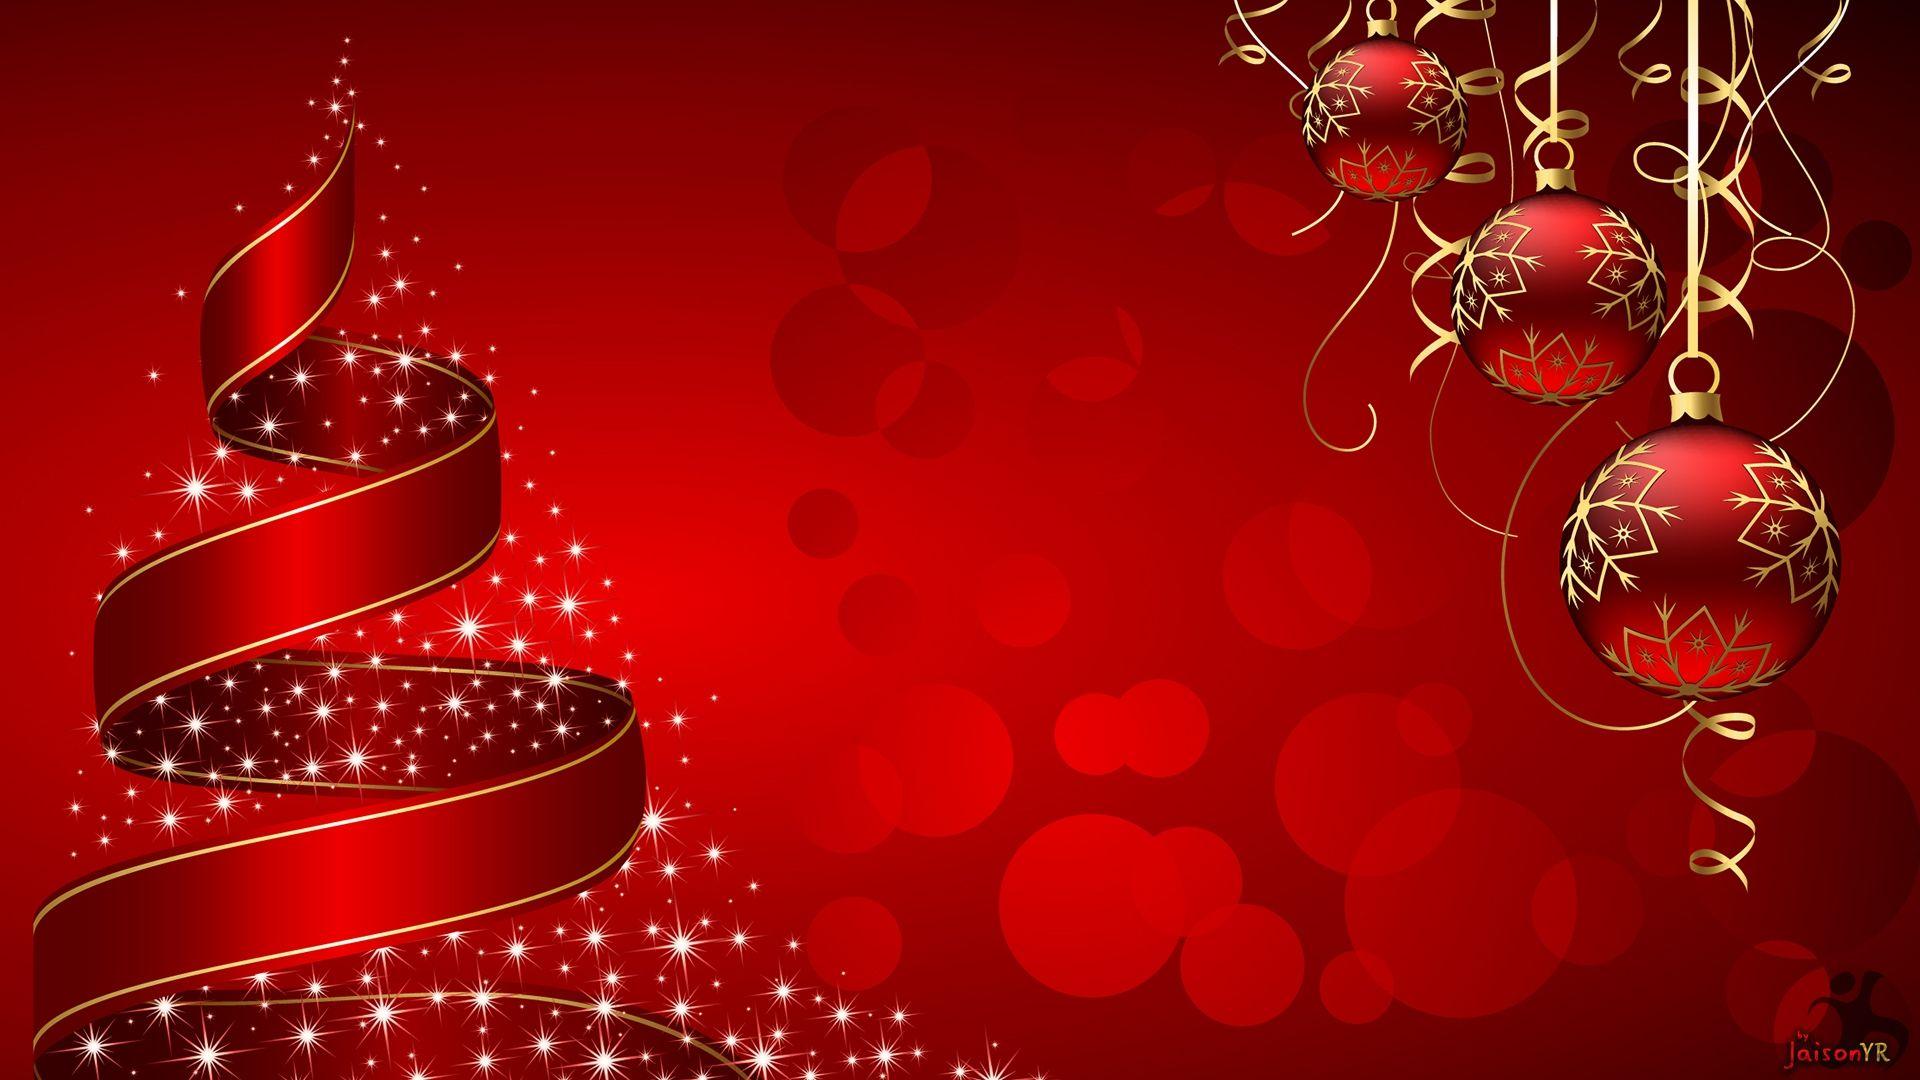 Small Christmas Tree HD Desktop Wallpaper High Definition